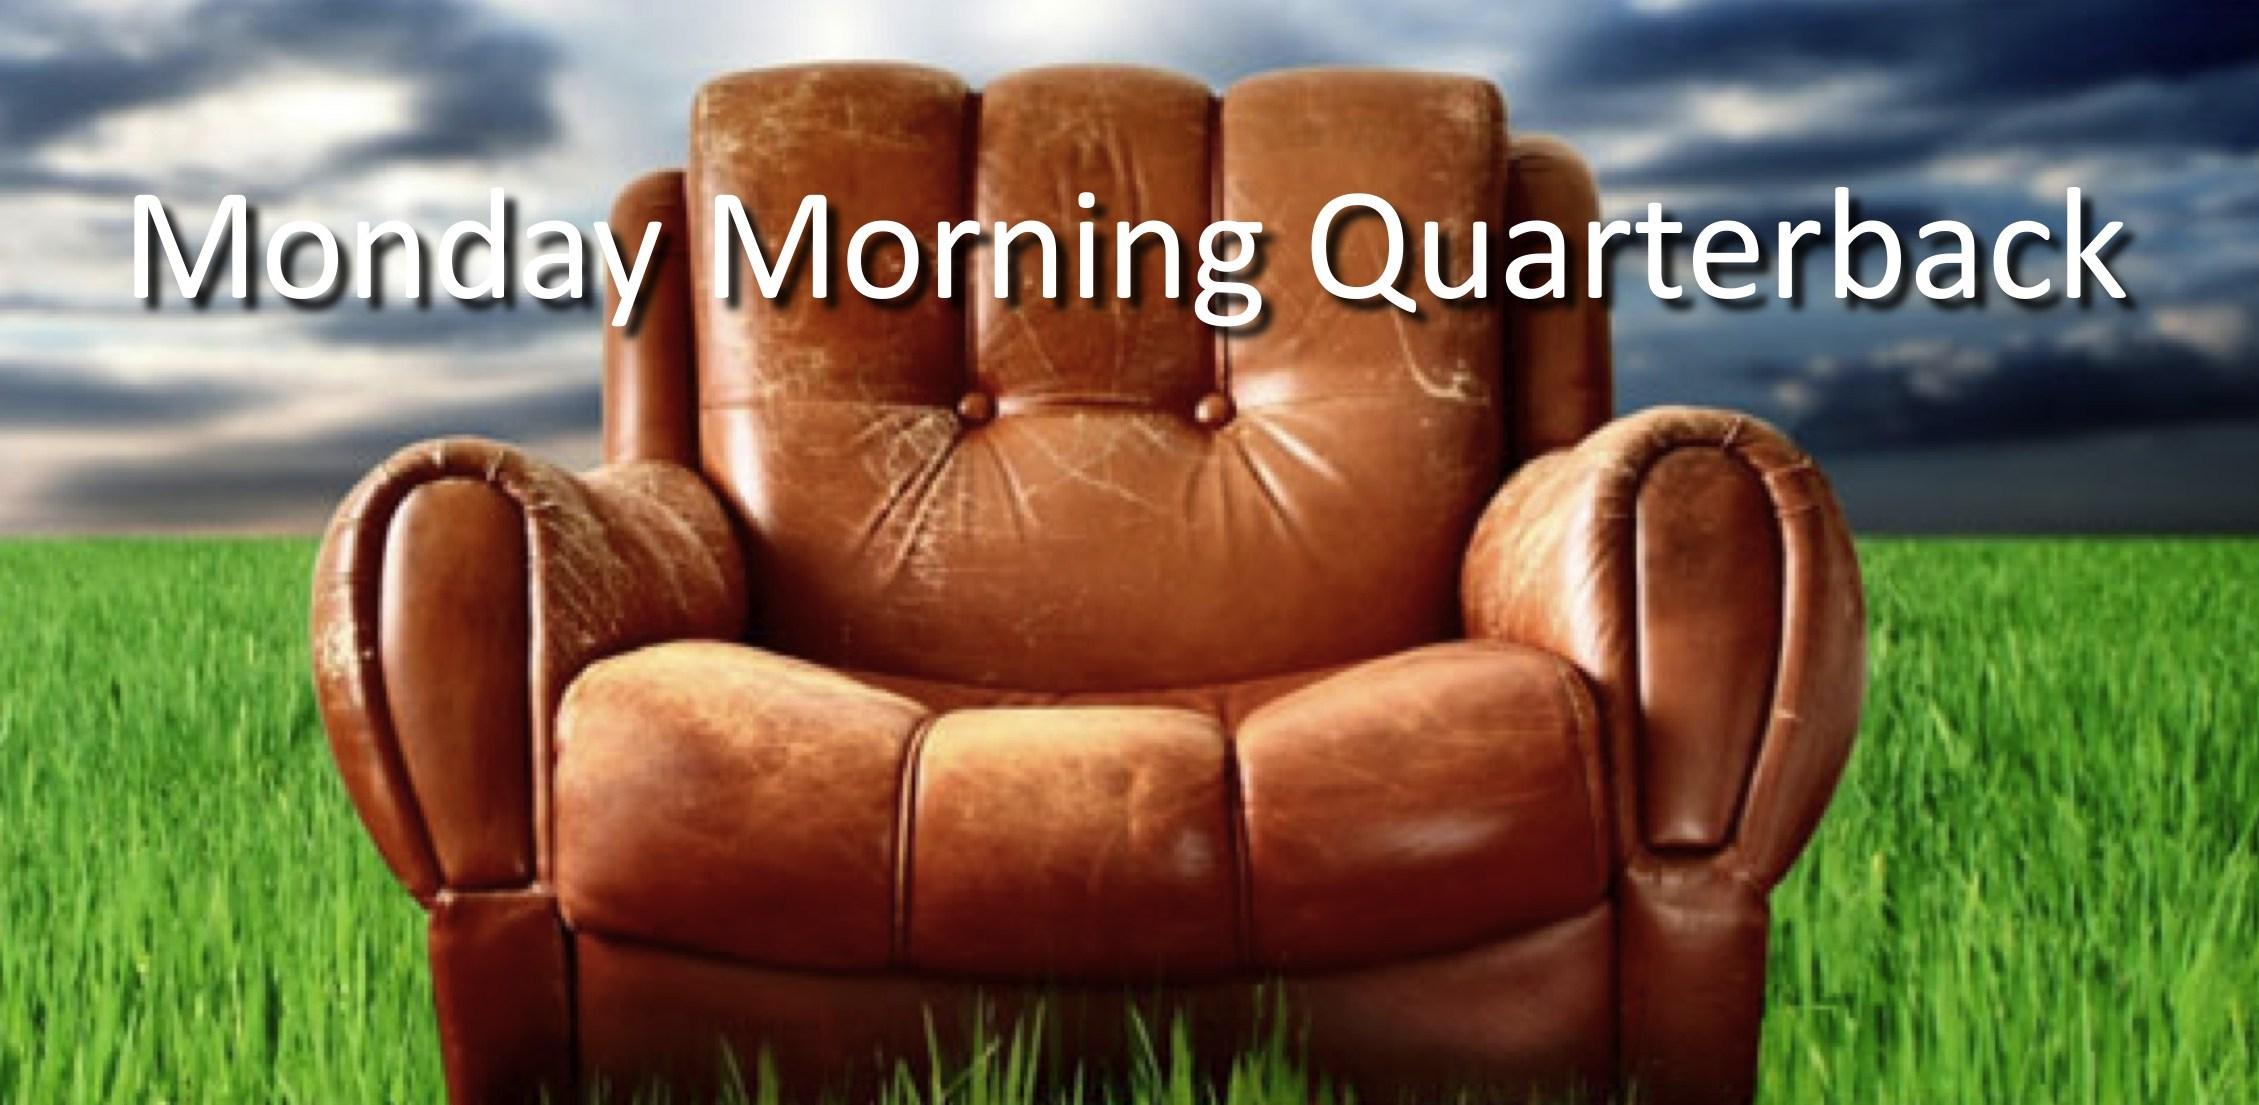 Monday Morning Quarterback – Champagne, Spankz & Bacon